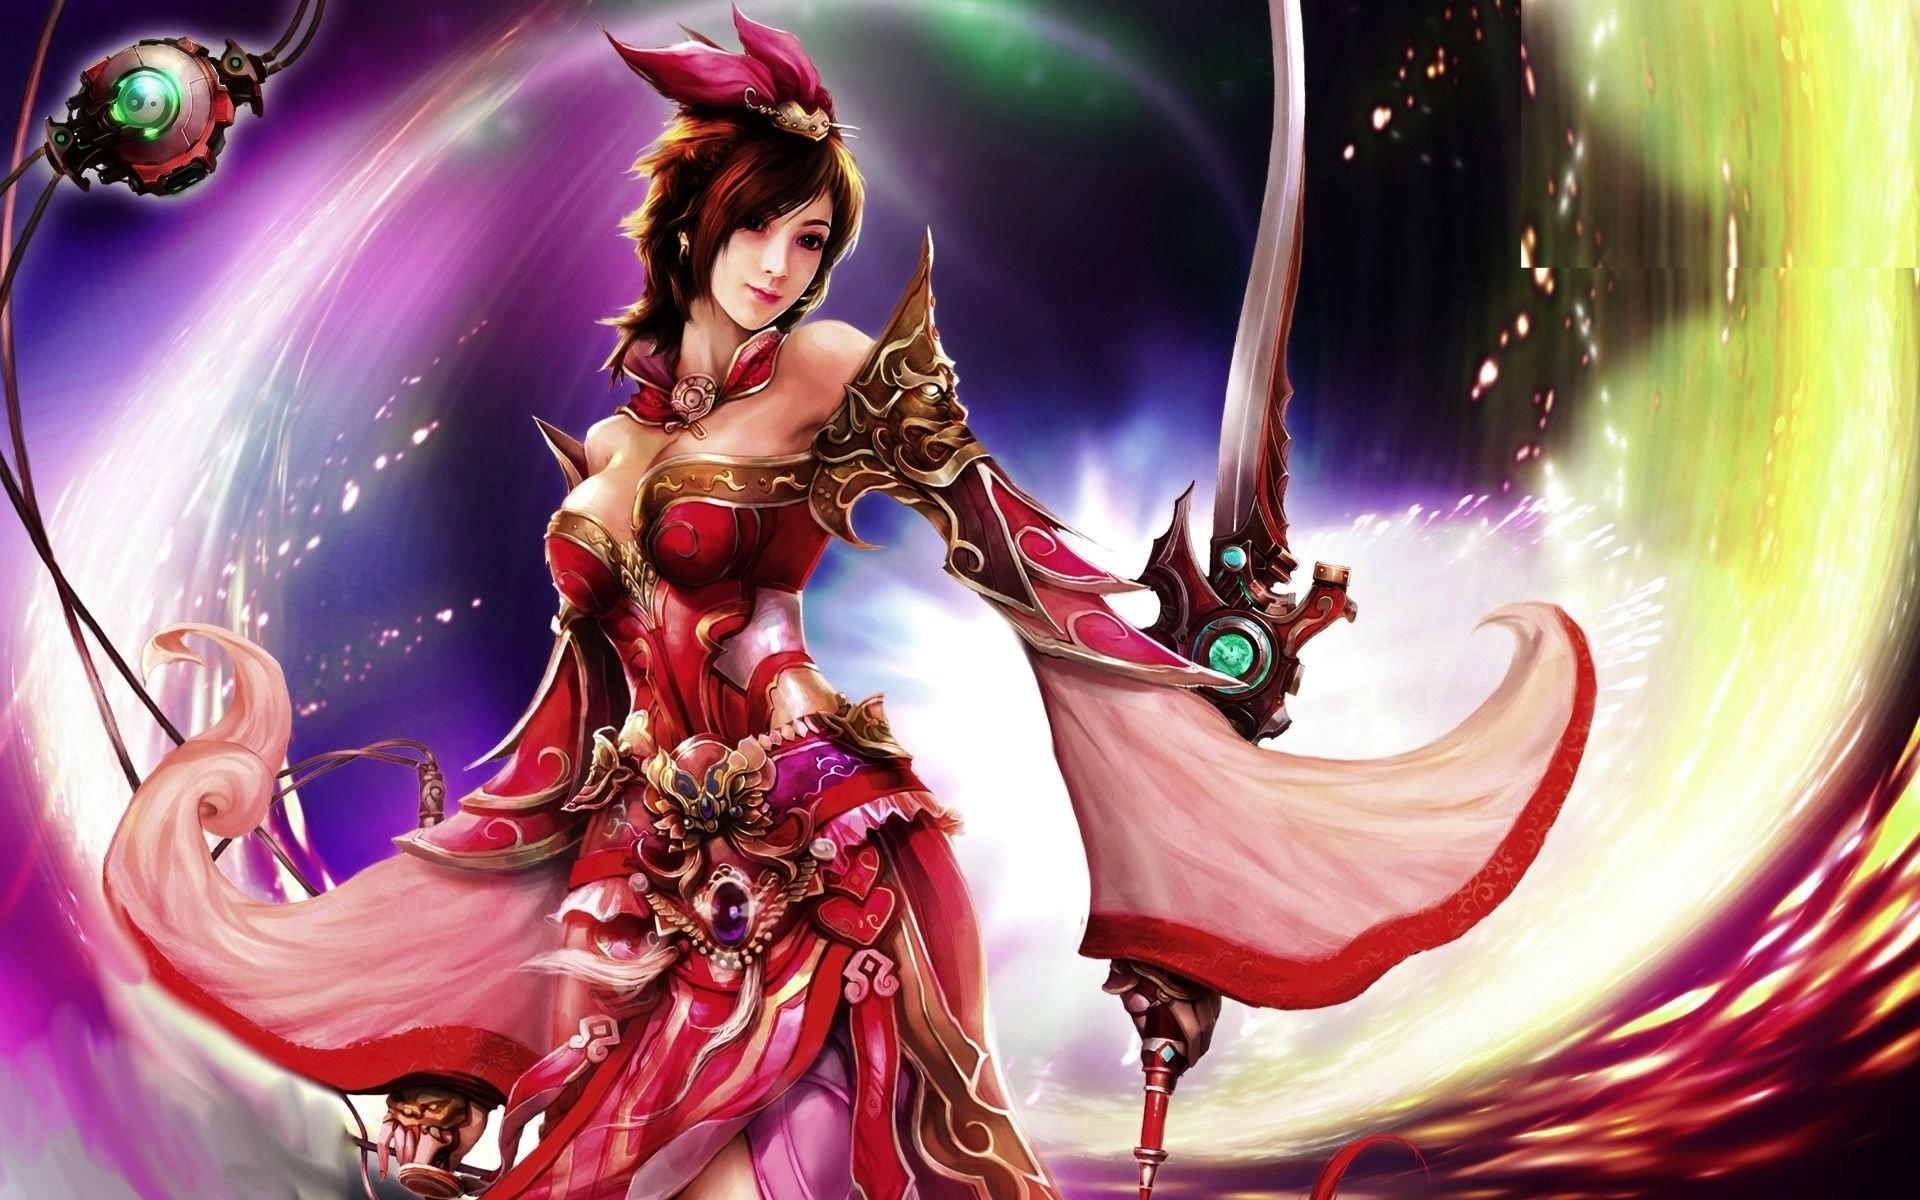 Beautiful Asian Woman Warrior